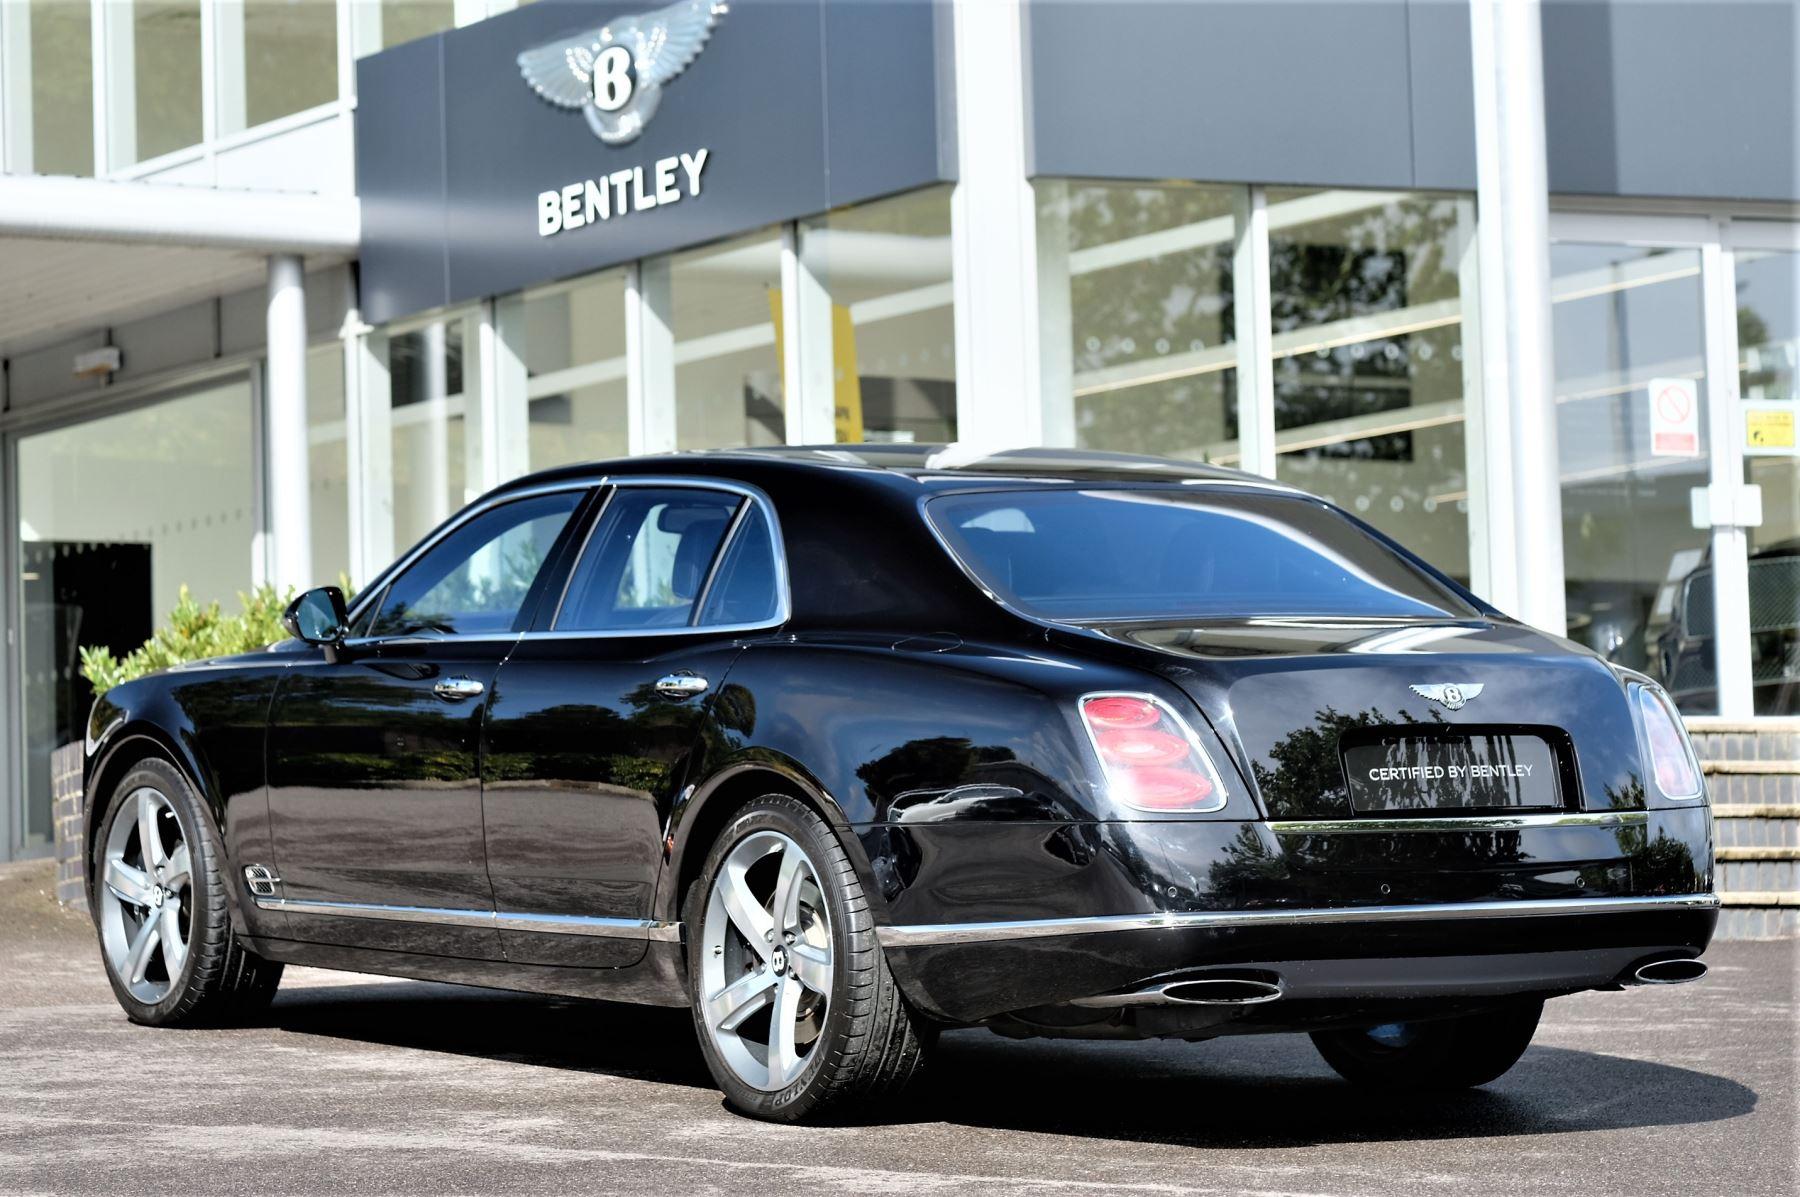 Bentley Mulsanne 6.8 V8 Speed image 5